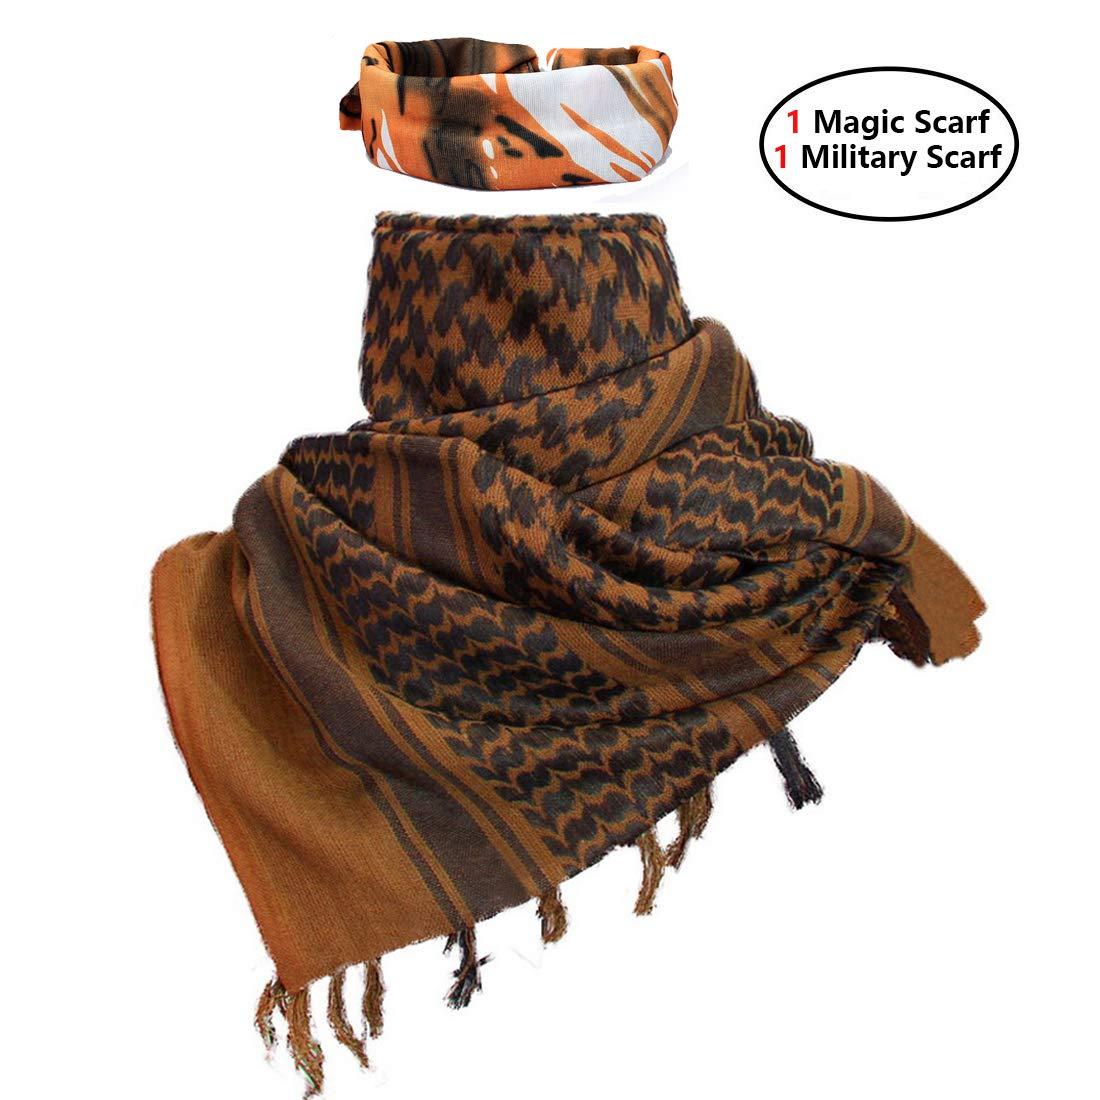 iMucci 43x43 Arab Tactical Scarf 100% Cotton - with Magic Bandanas Desert Shemagh Military Keffiyeh Head Neck Wrap Scarfs for Men and Women (Black) Shenglin